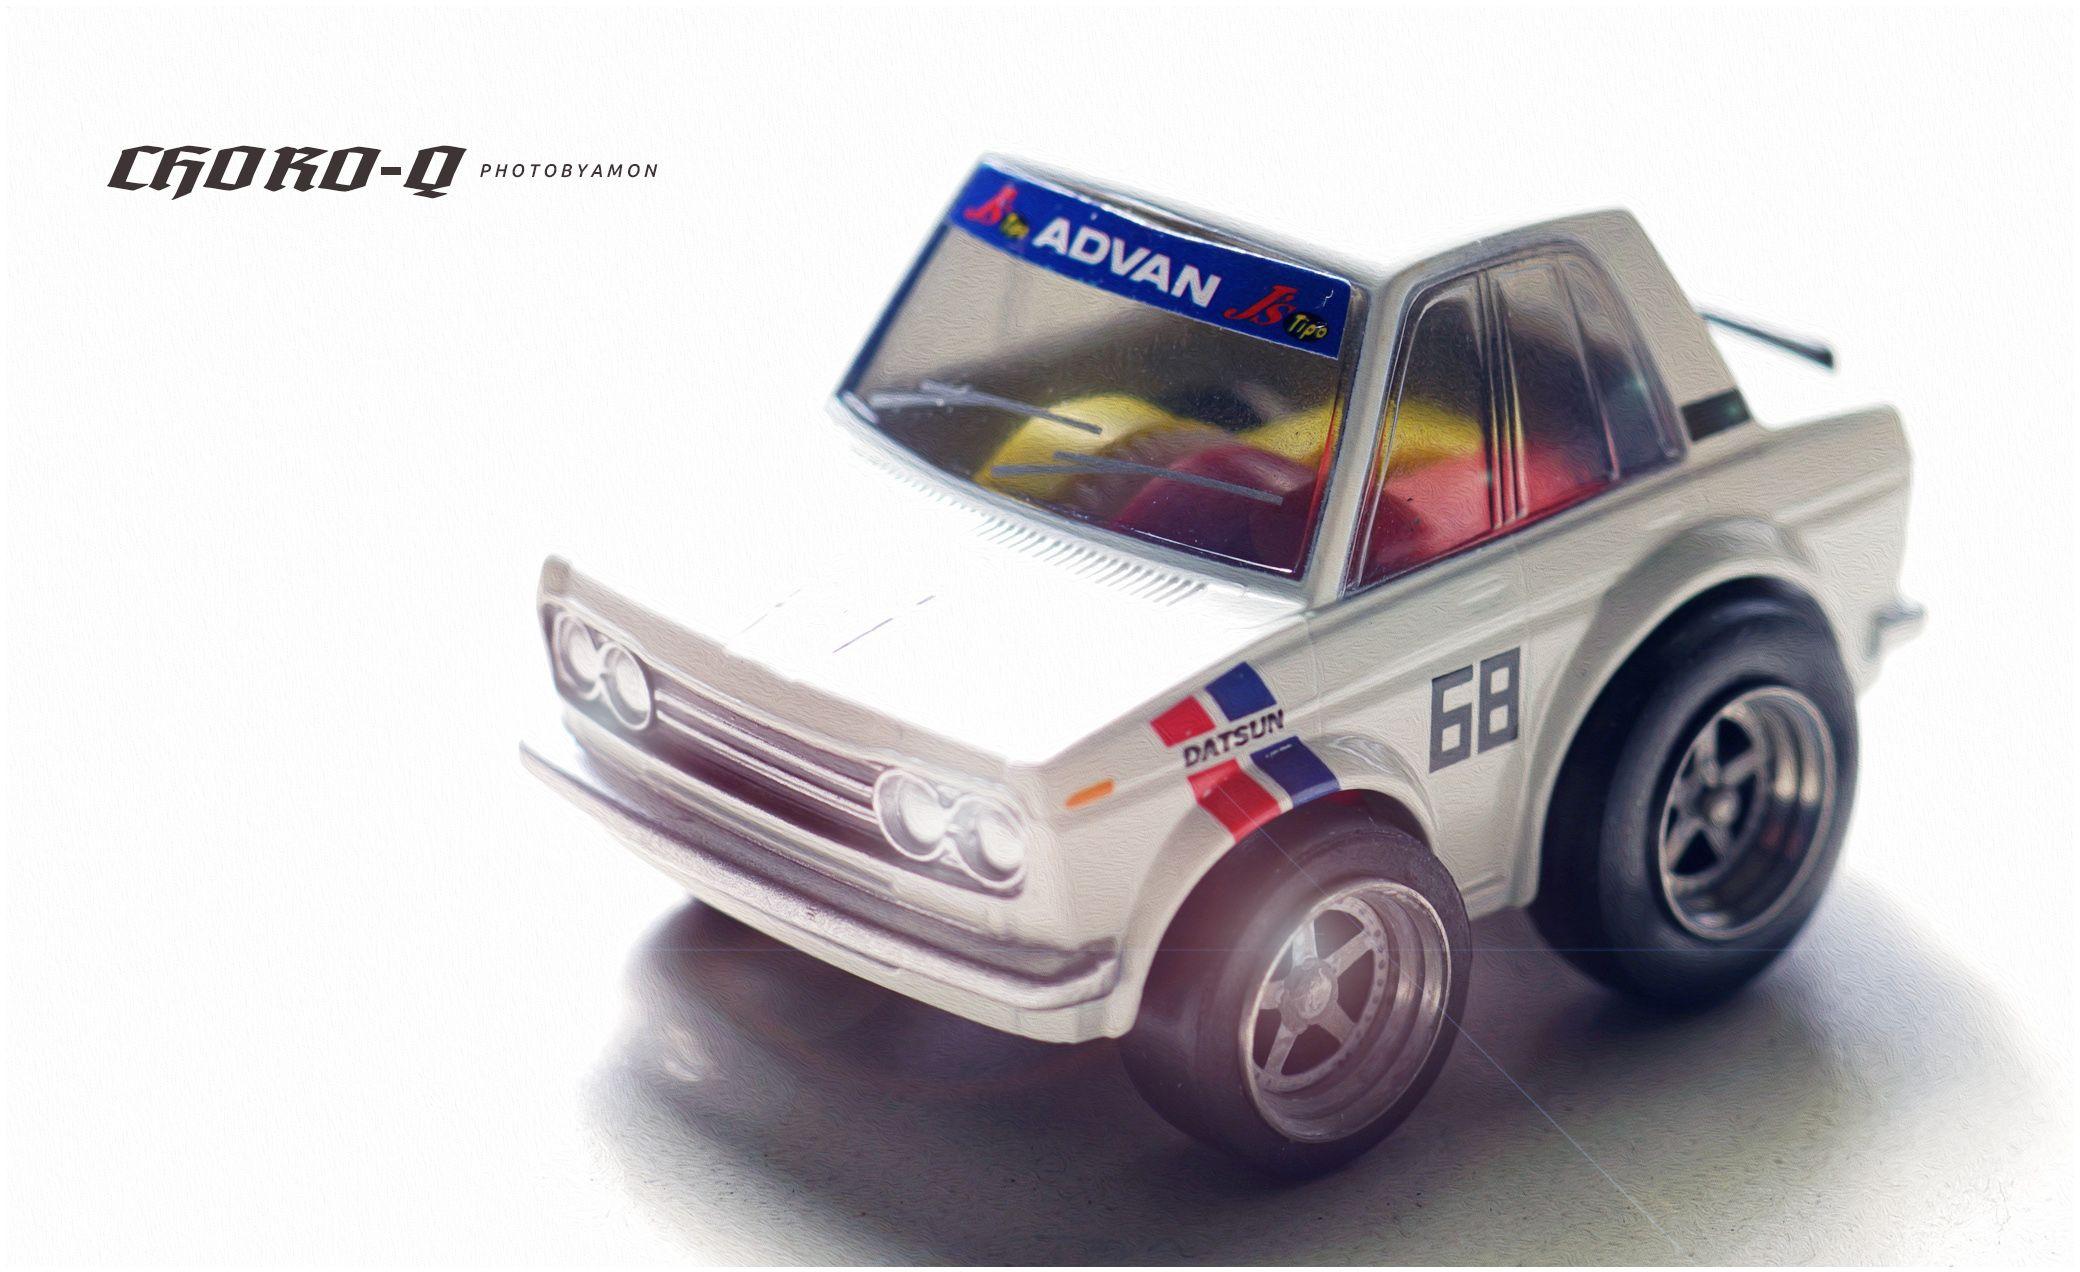 Photo By Amon Smart Cars Choro Q Q Car Hunter Car Toy Toy Car Car Toys